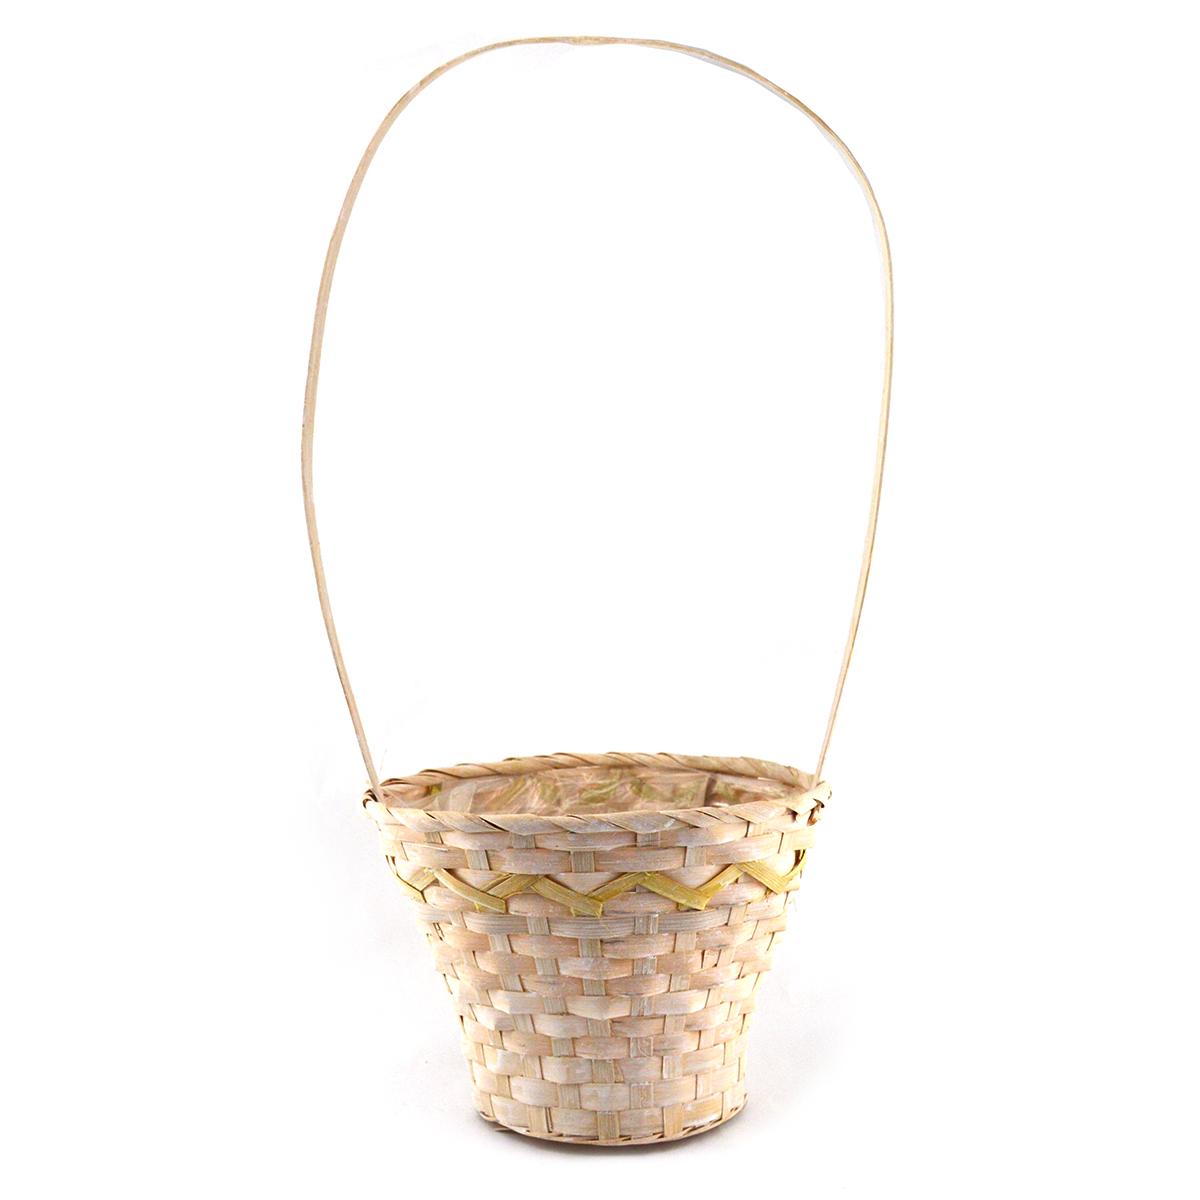 Ambalaje Flori ONLINE vinde Cos impletit bambus inalt model natur-galben la pretul de 9.9 lei